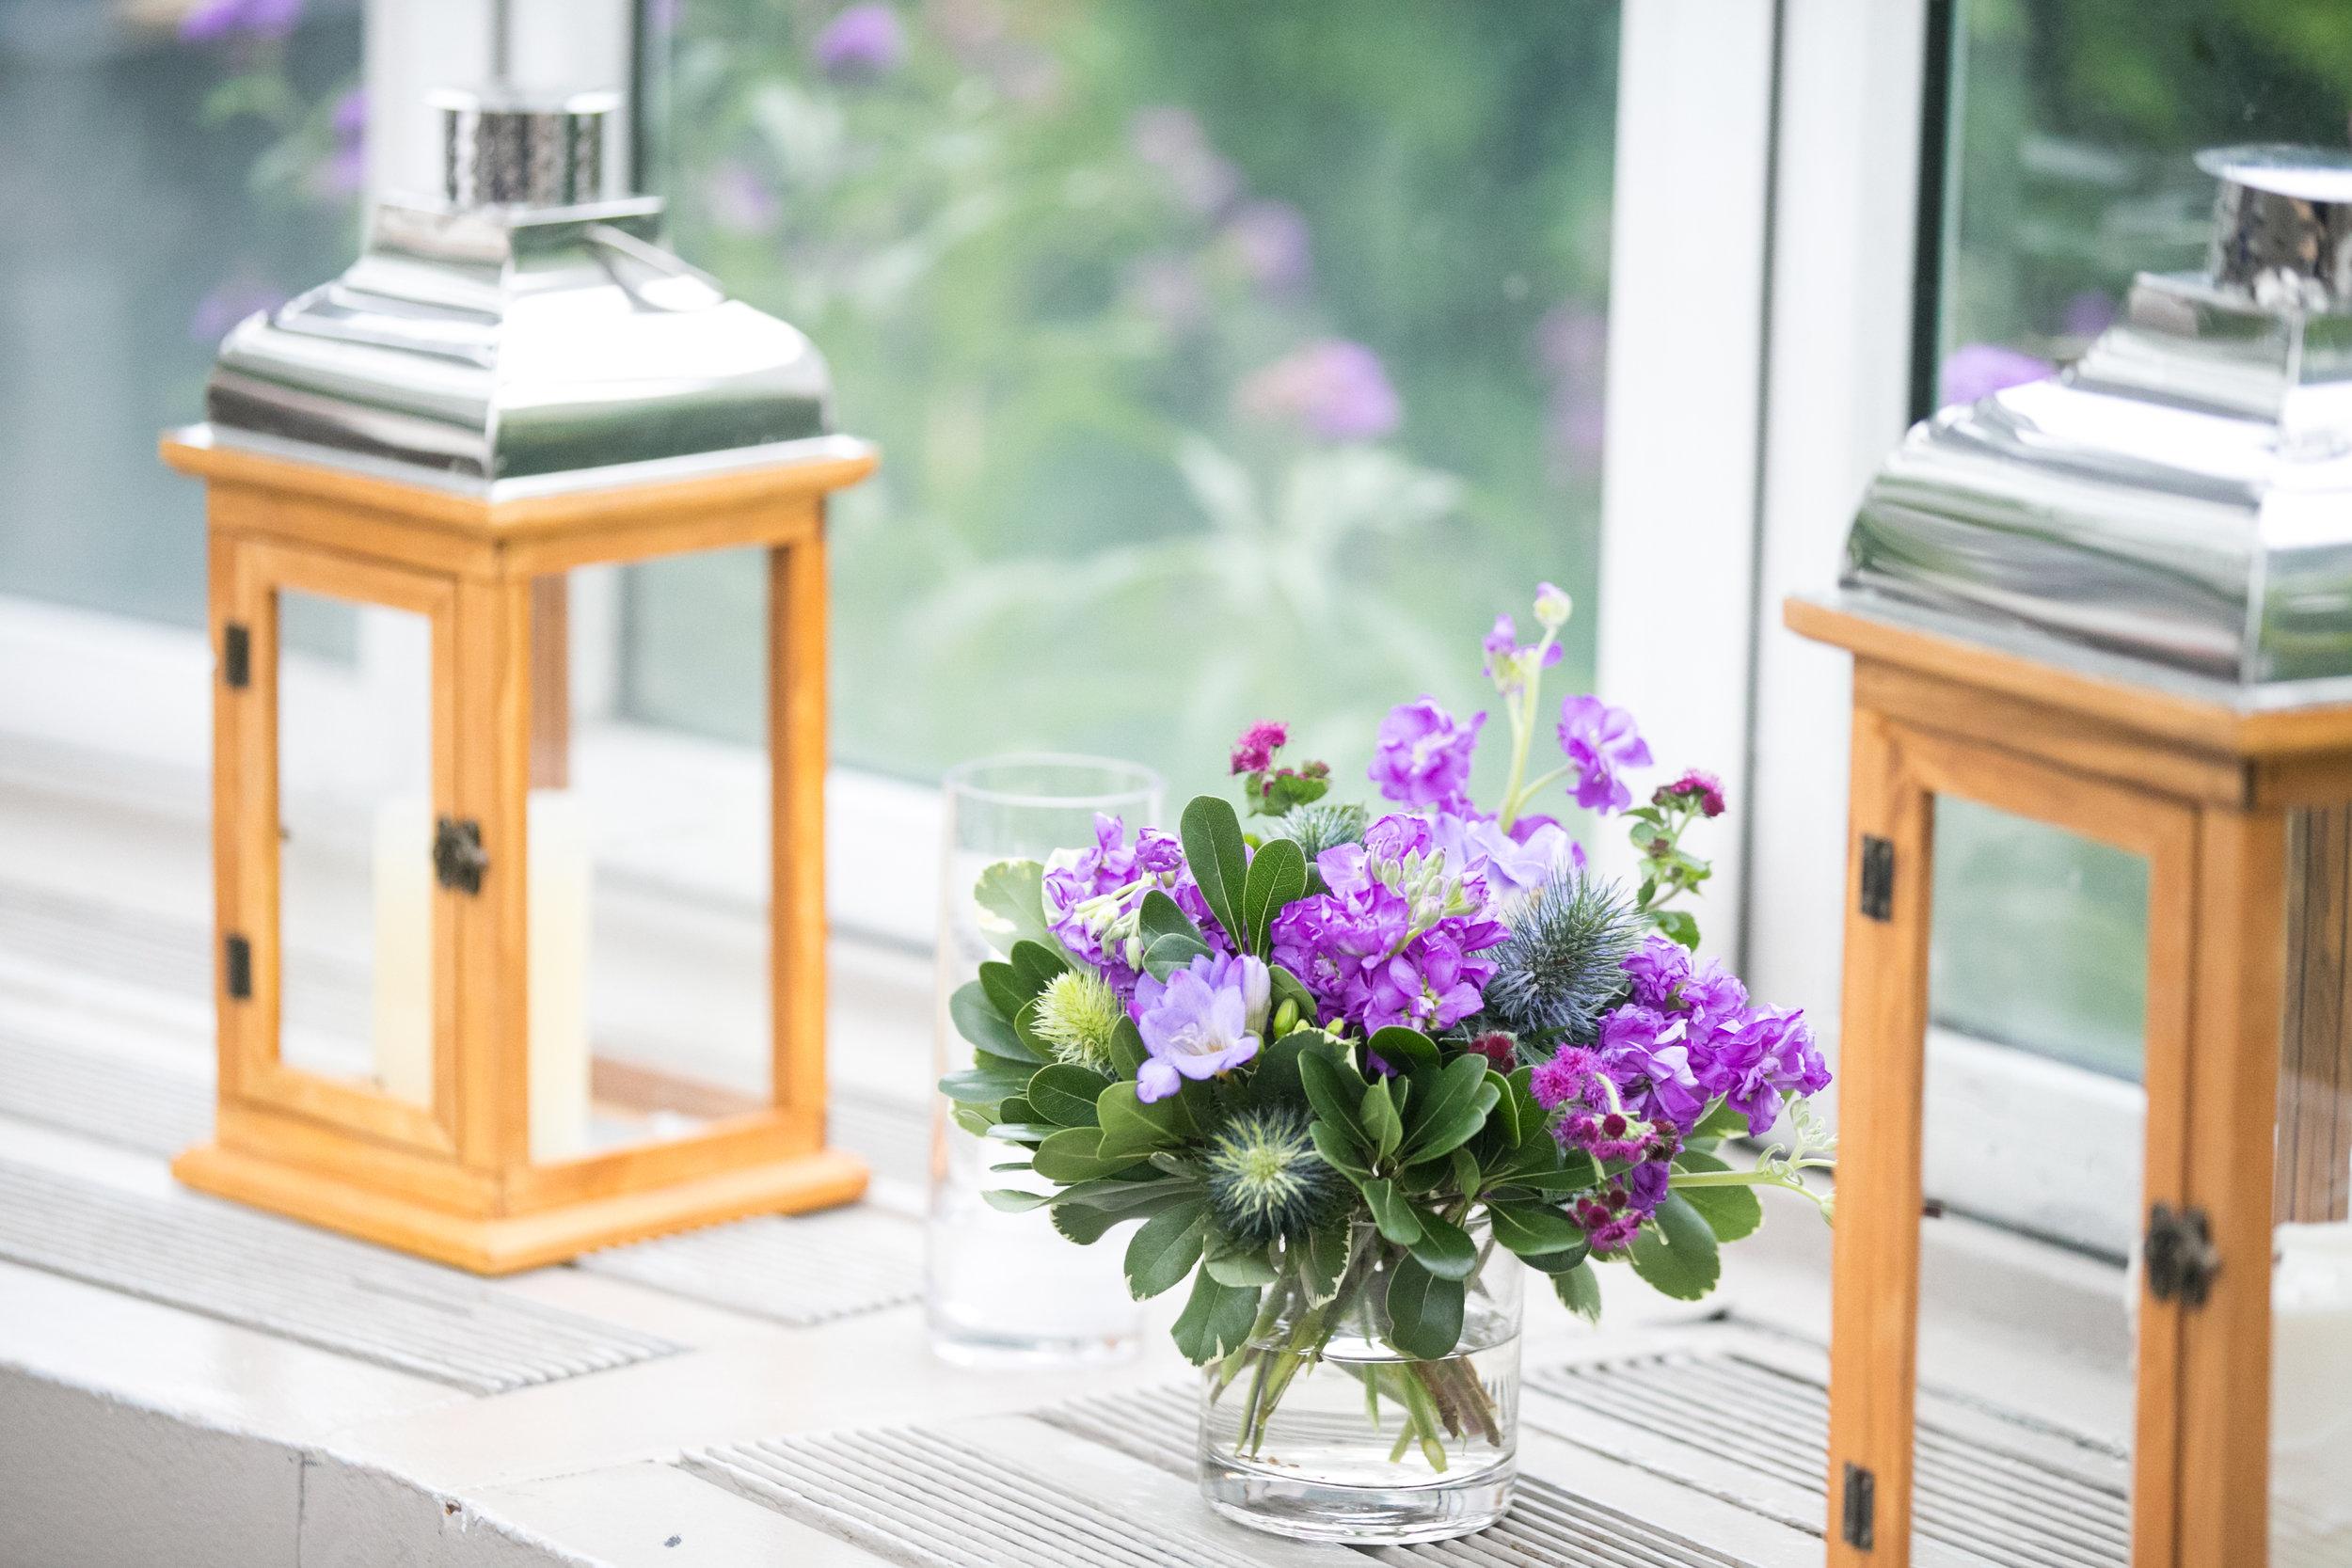 Purple flowers and lanterns